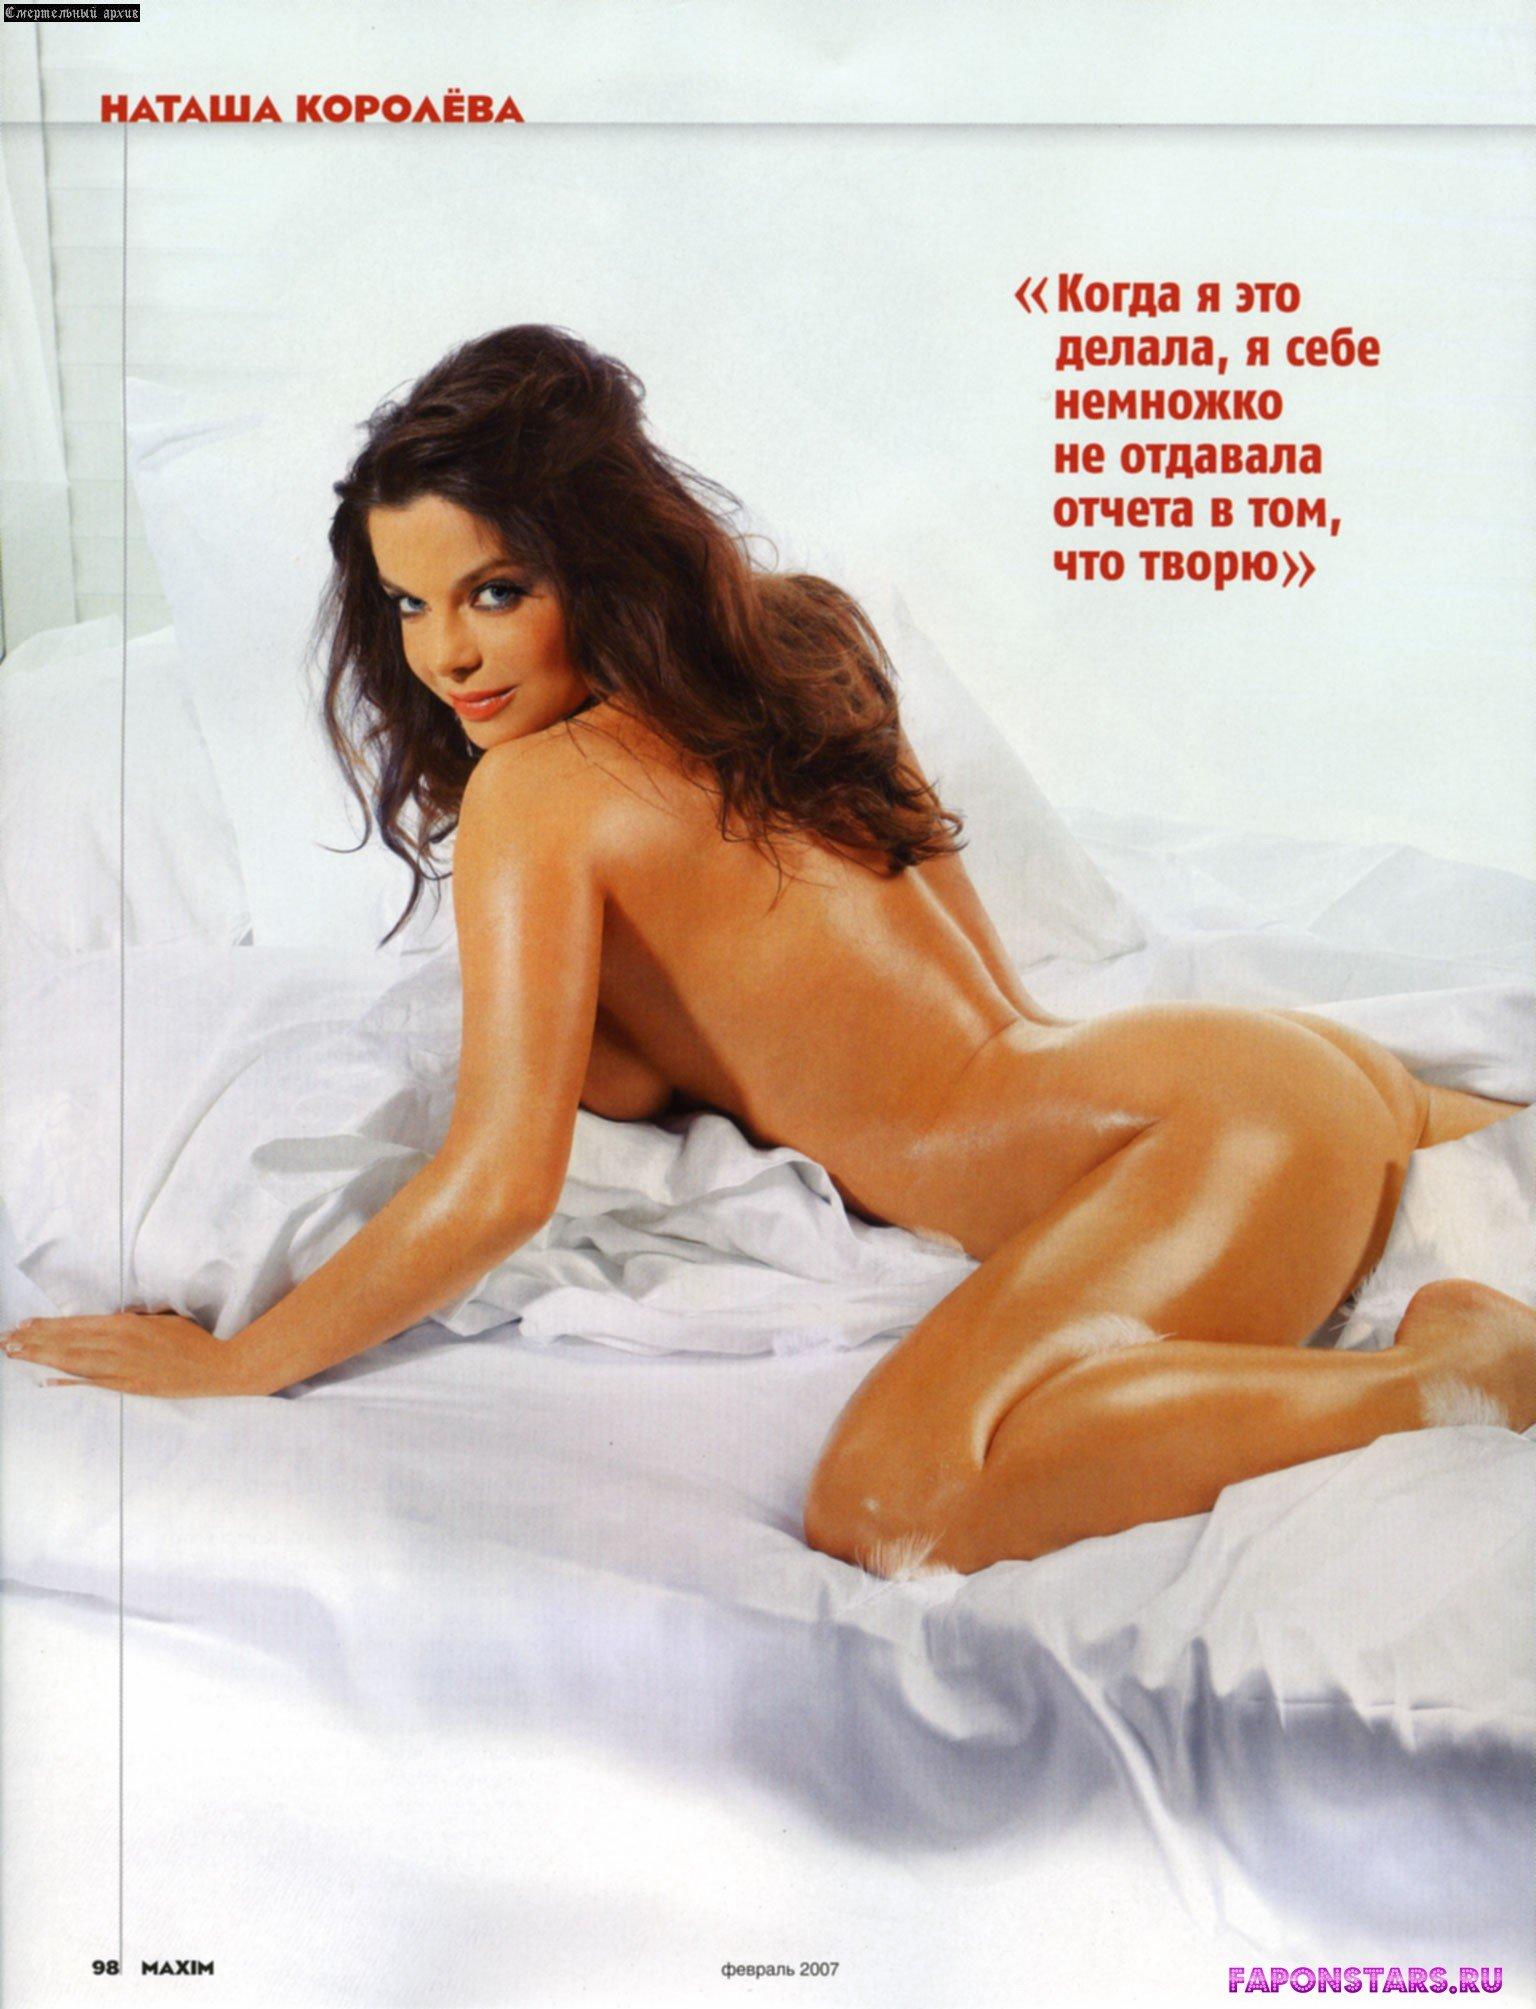 Секс наталия королева 6 фотография